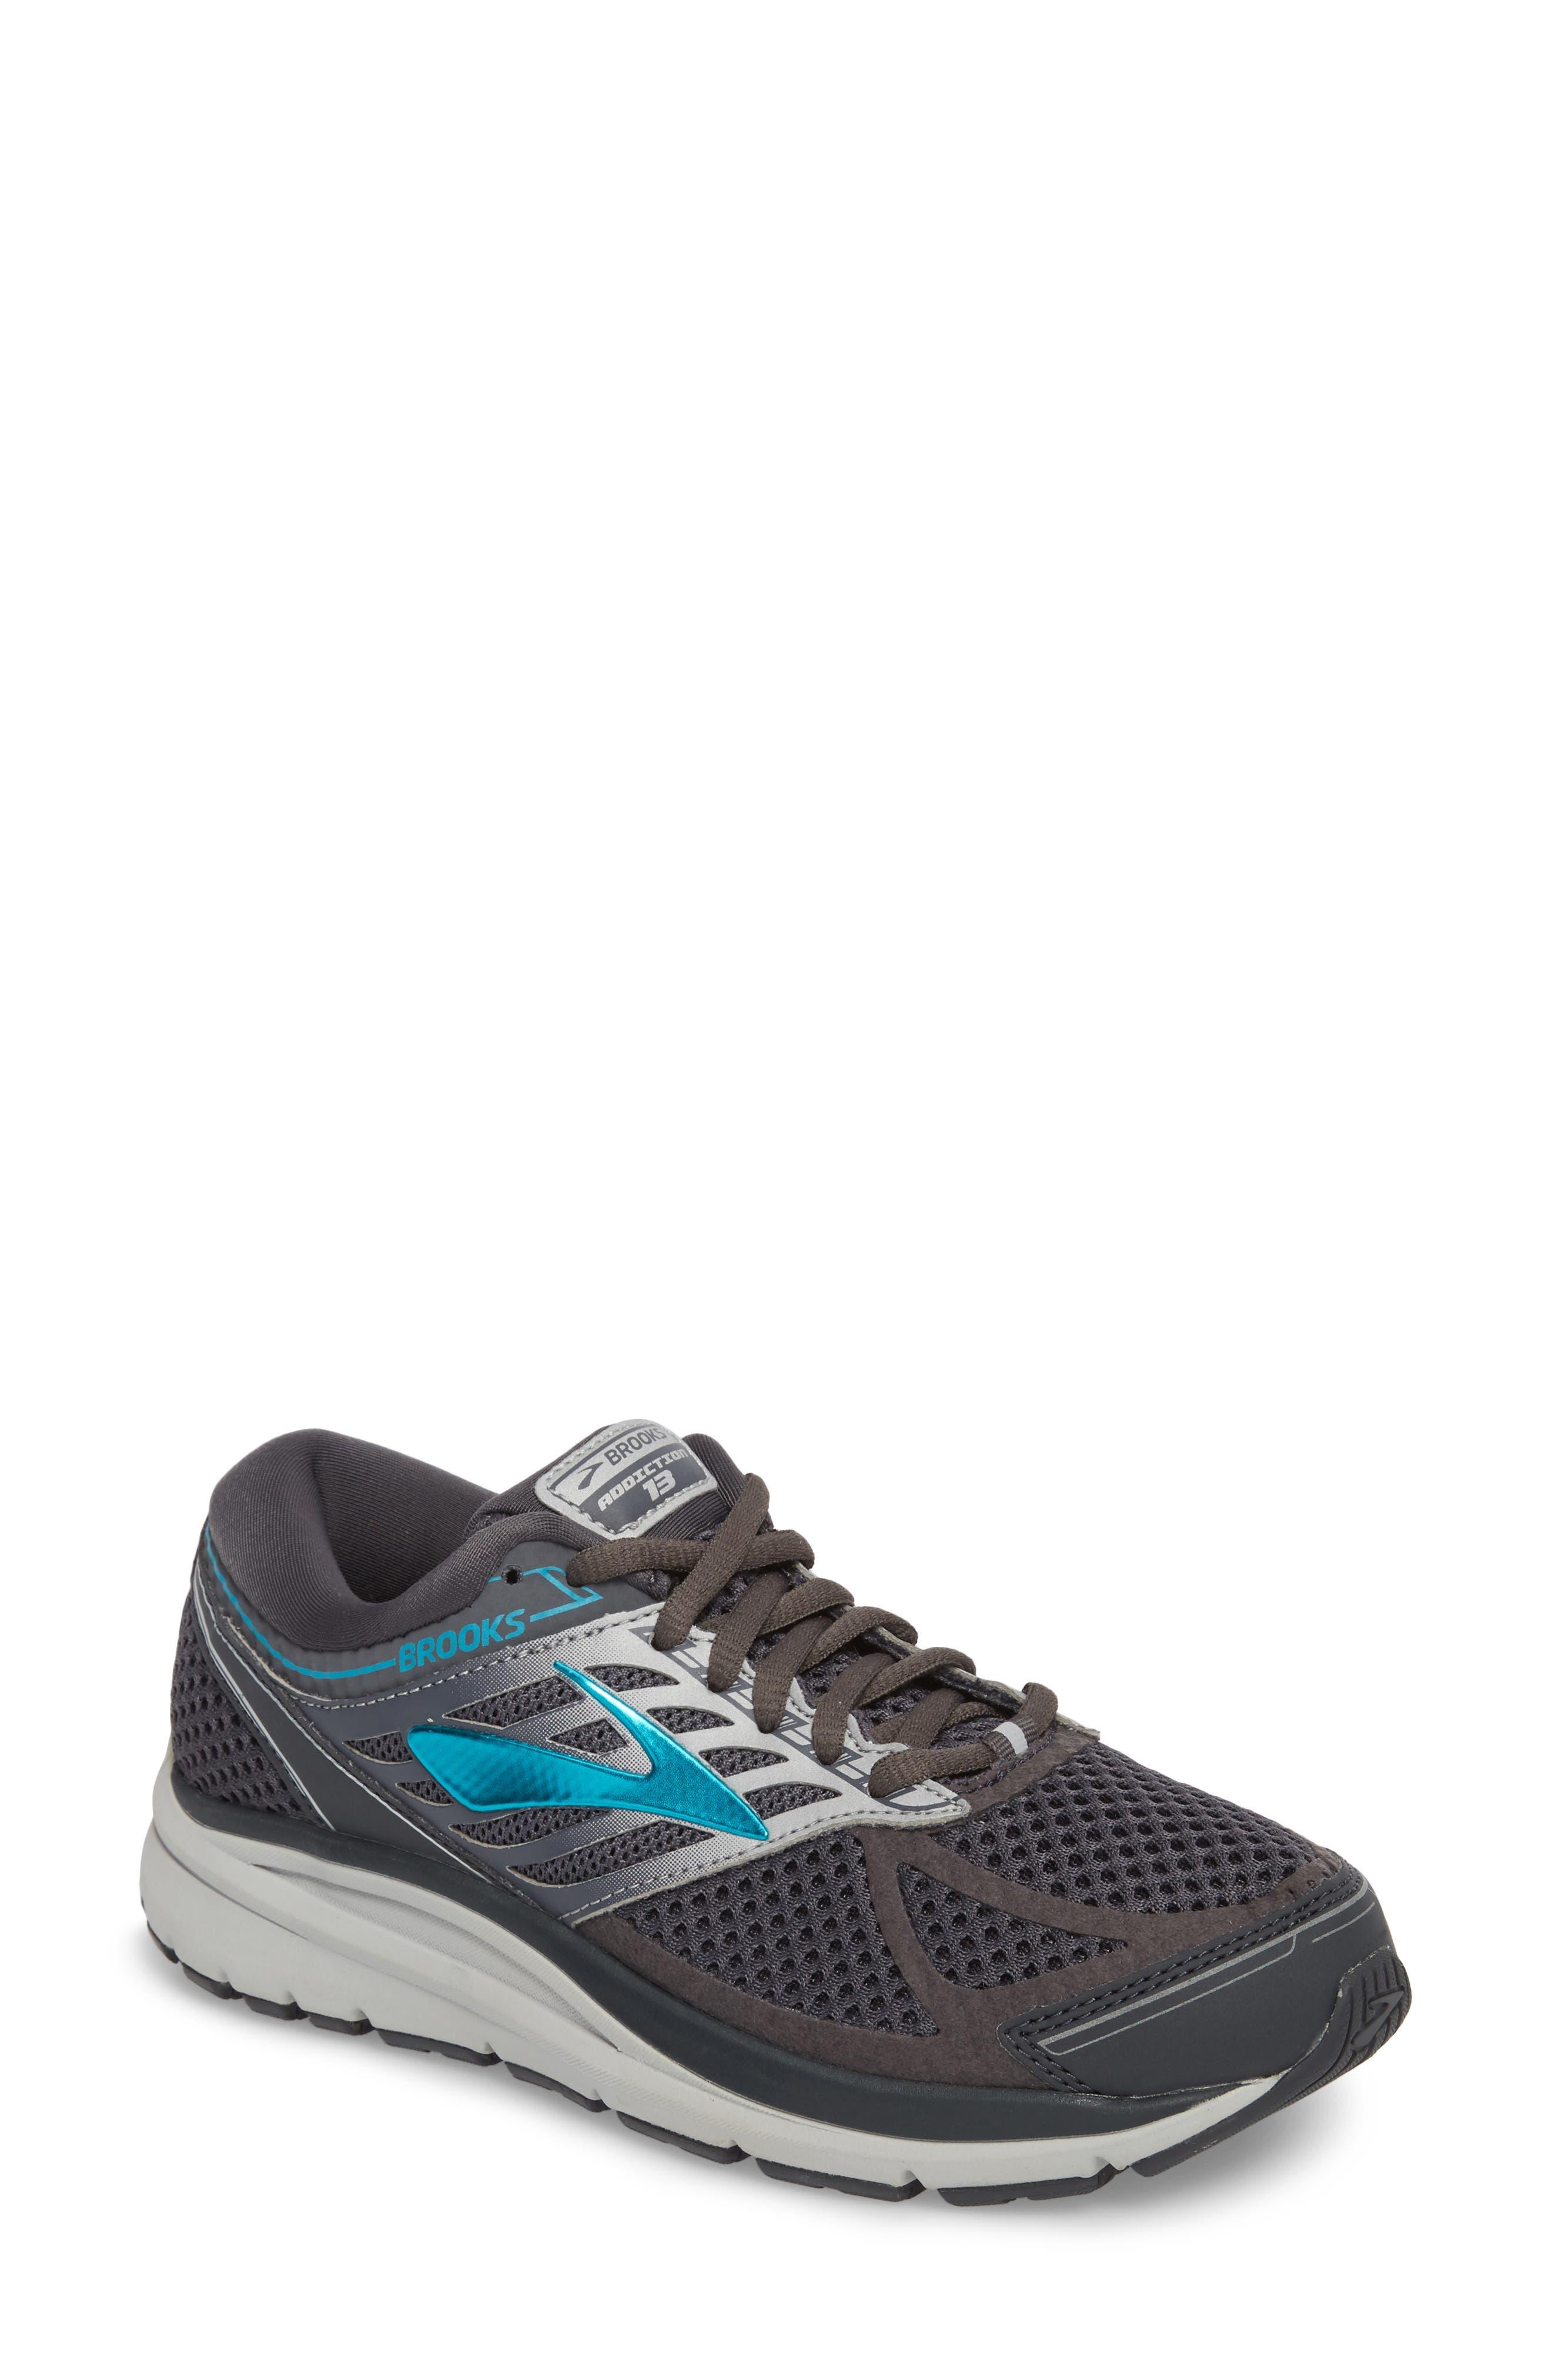 Brooks Addiction 13 Running Shoe, Grey